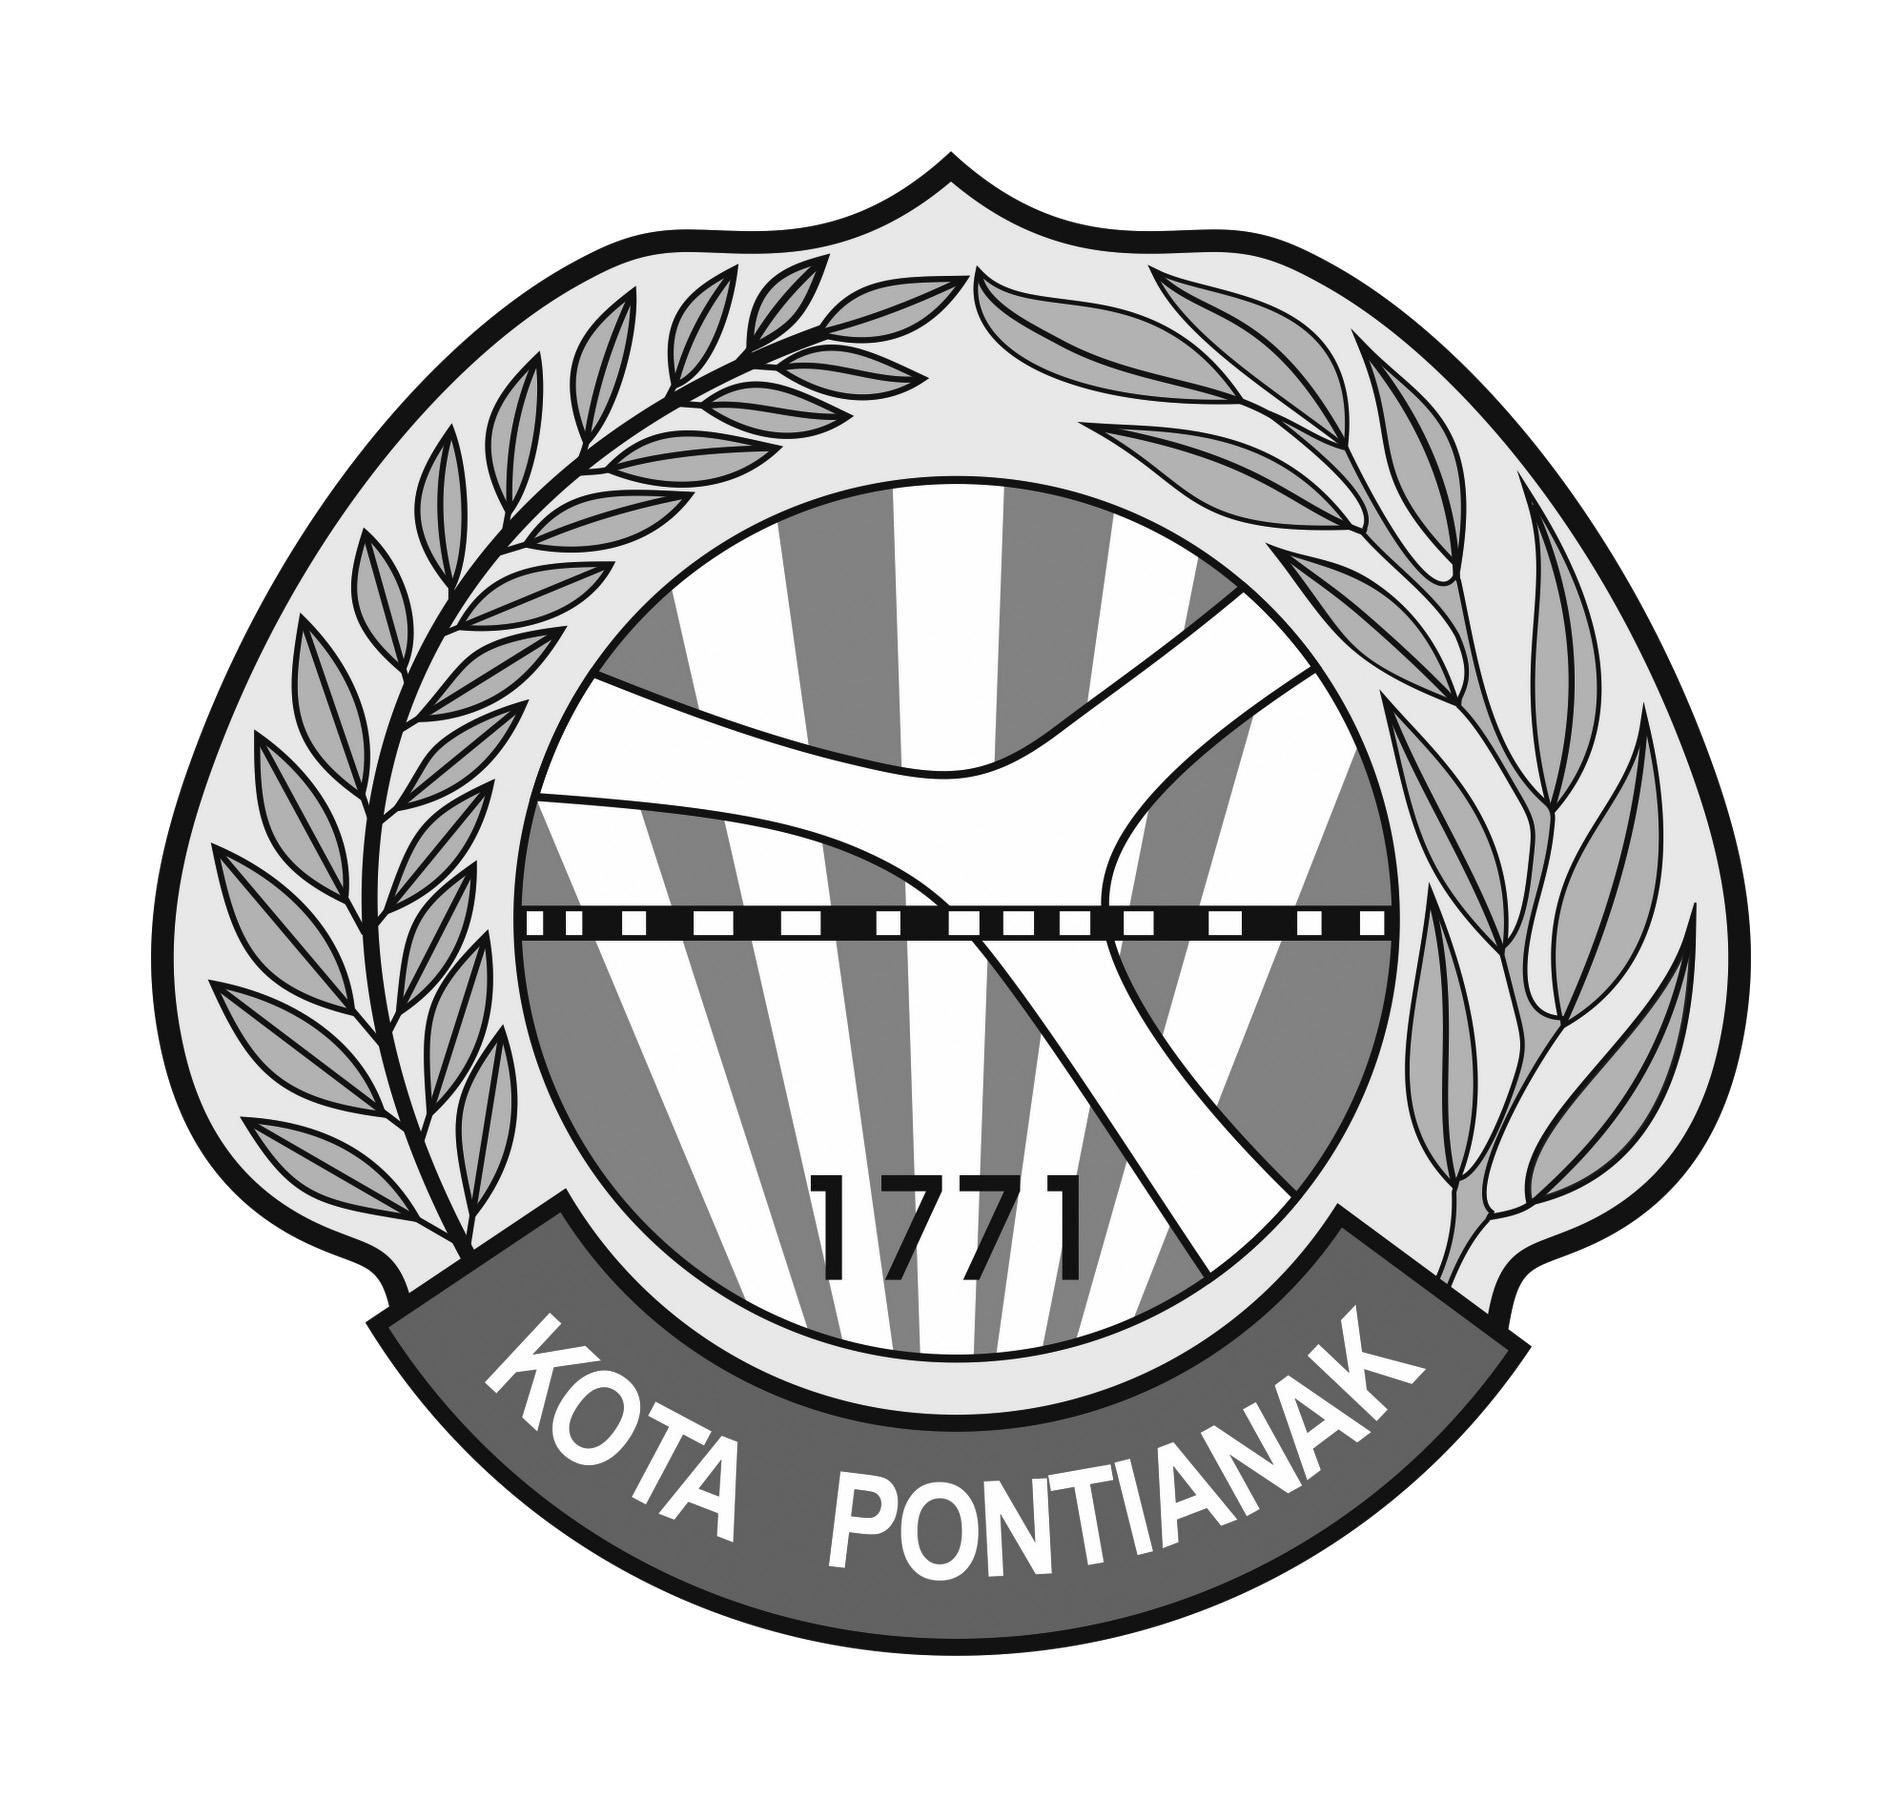 Logo Kota Pontianak (Provinsi Kalimantan Barat) Original Grayscale